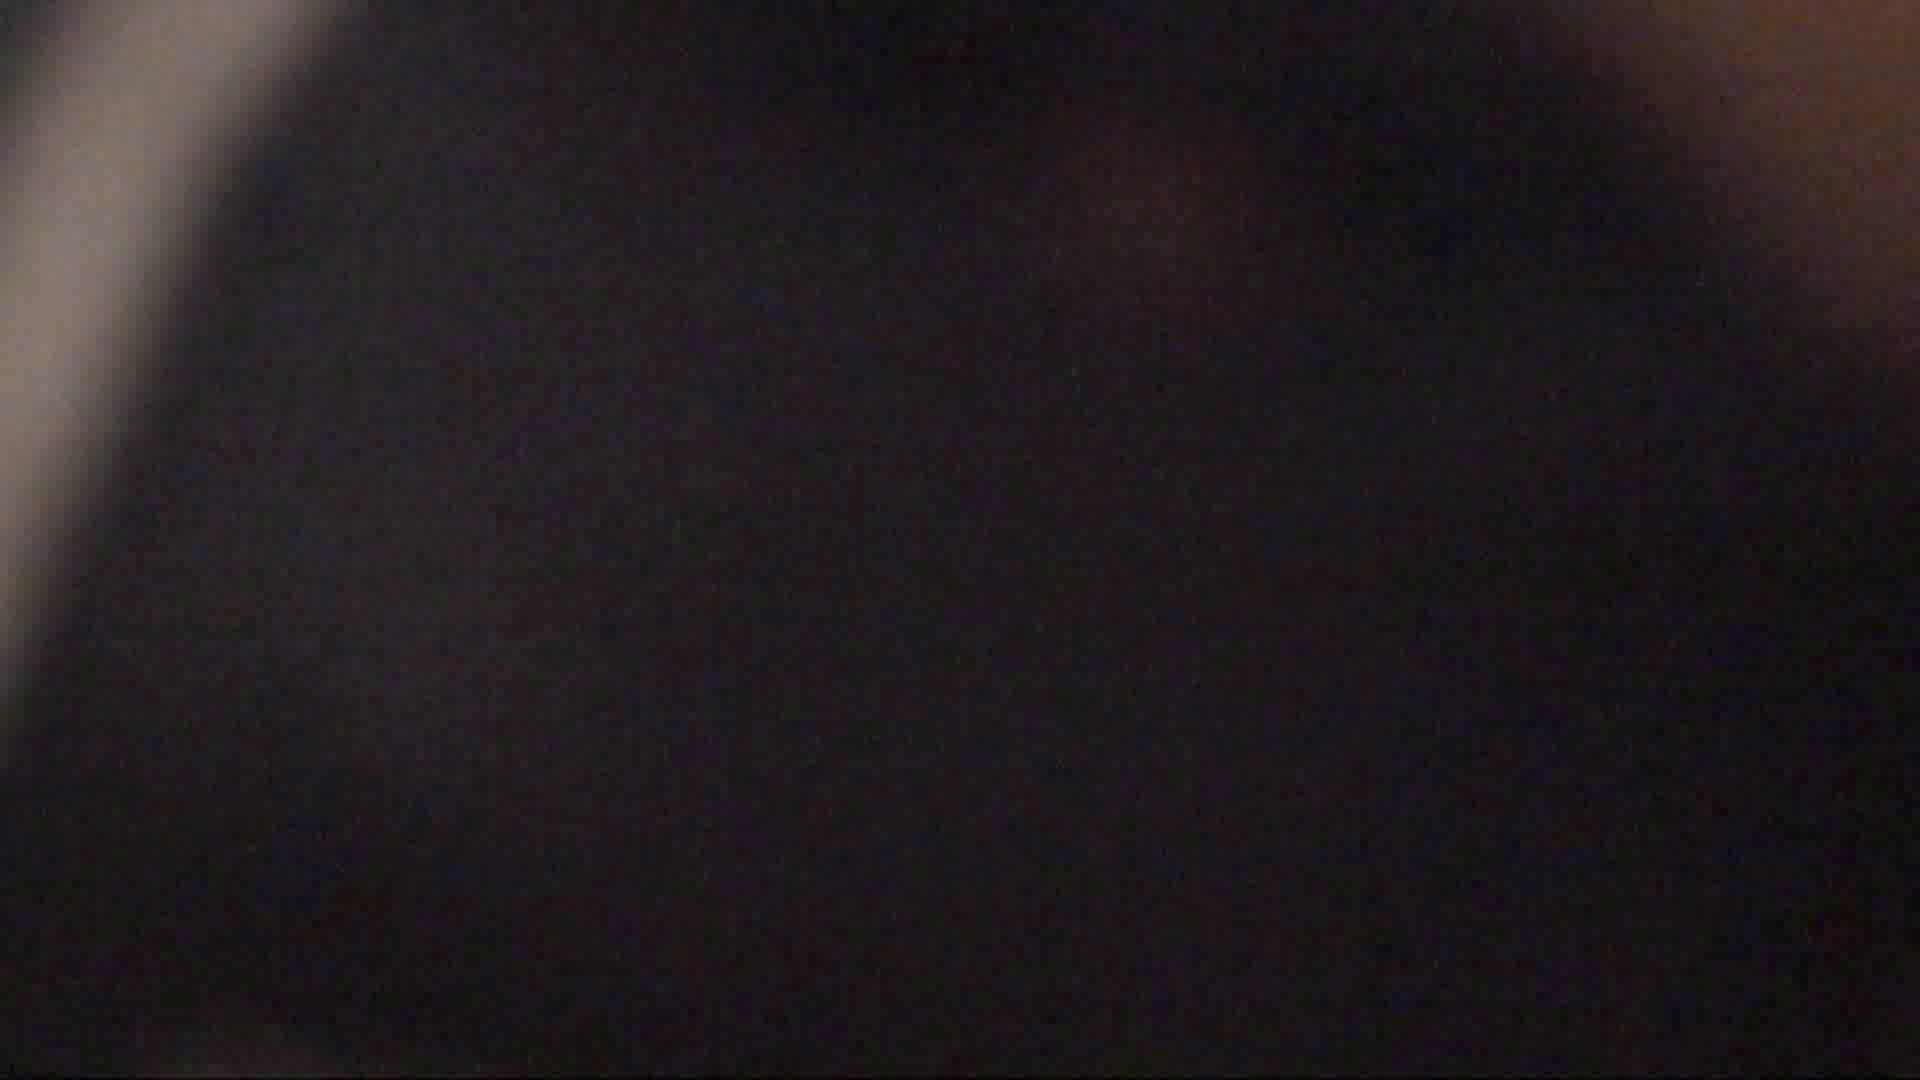 洗面所内潜入!同級生が同級生を盗撮! vol.02 洗面所 隠し撮りオマンコ動画紹介 98PIX 54